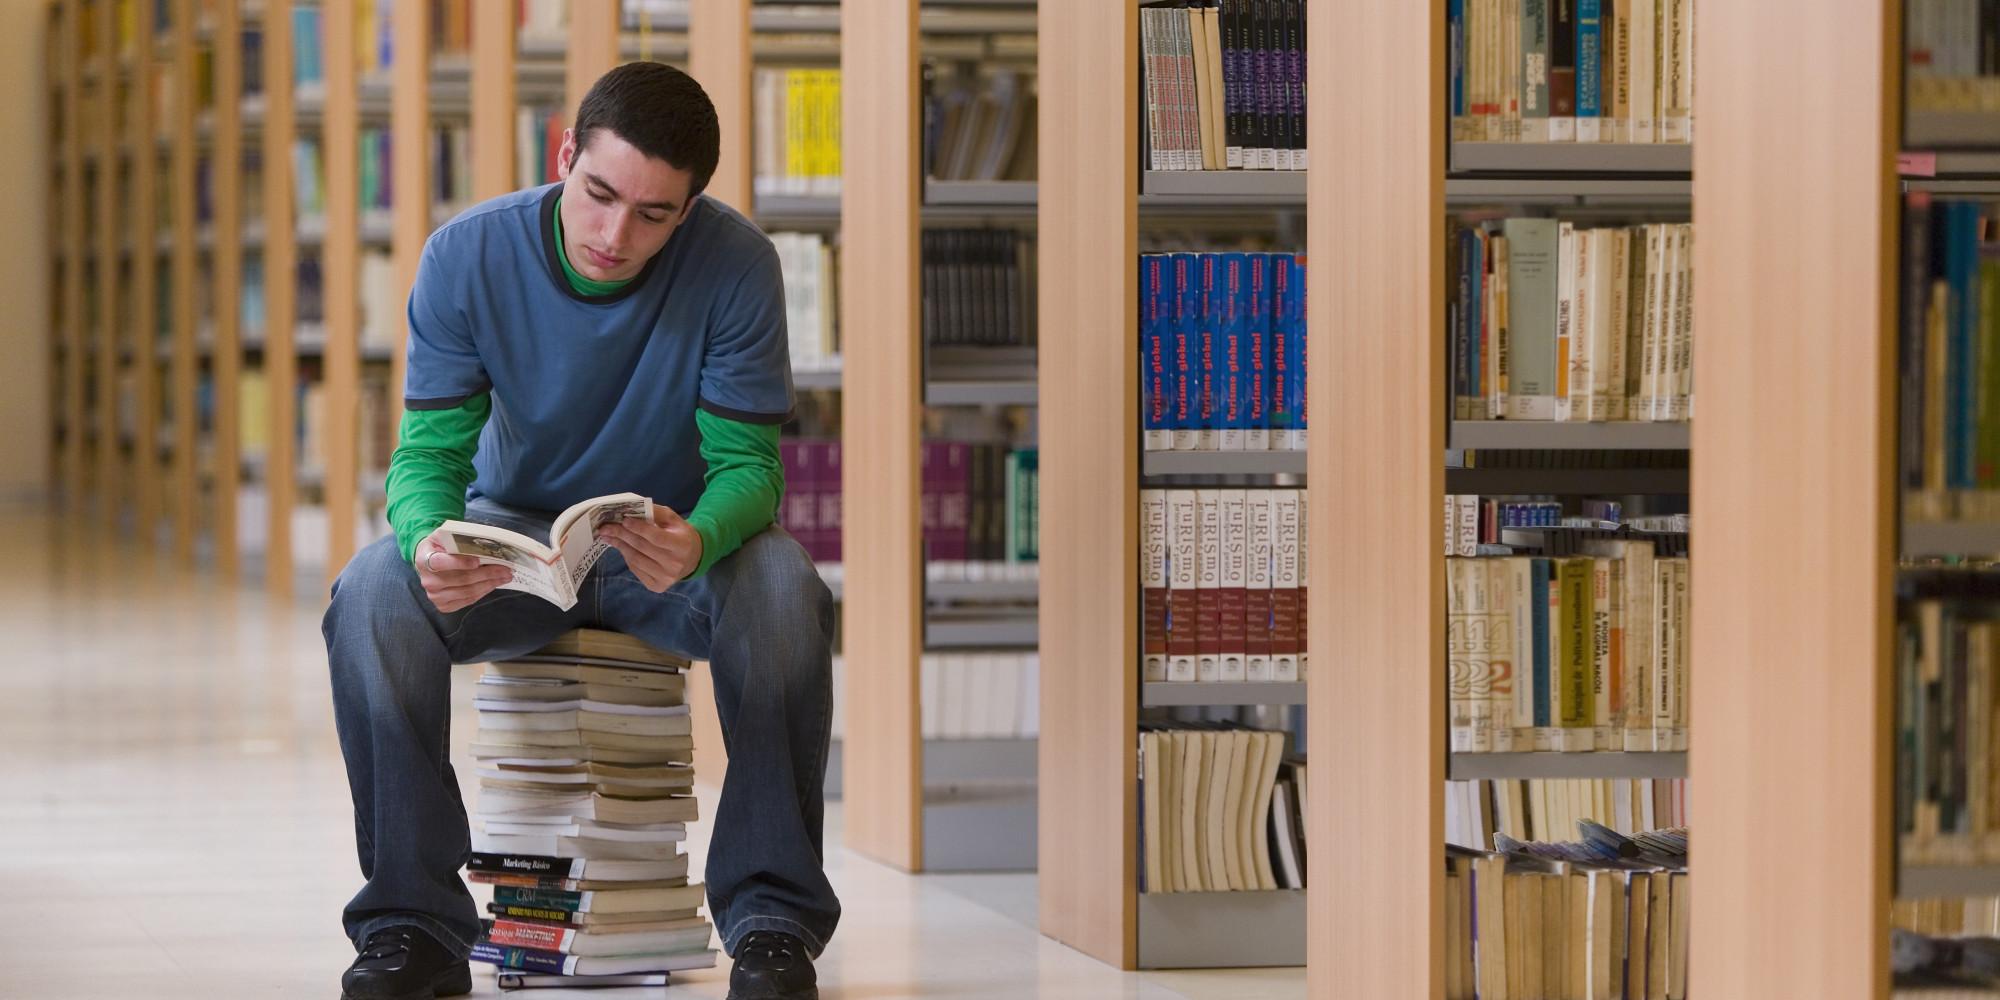 English essays for university students